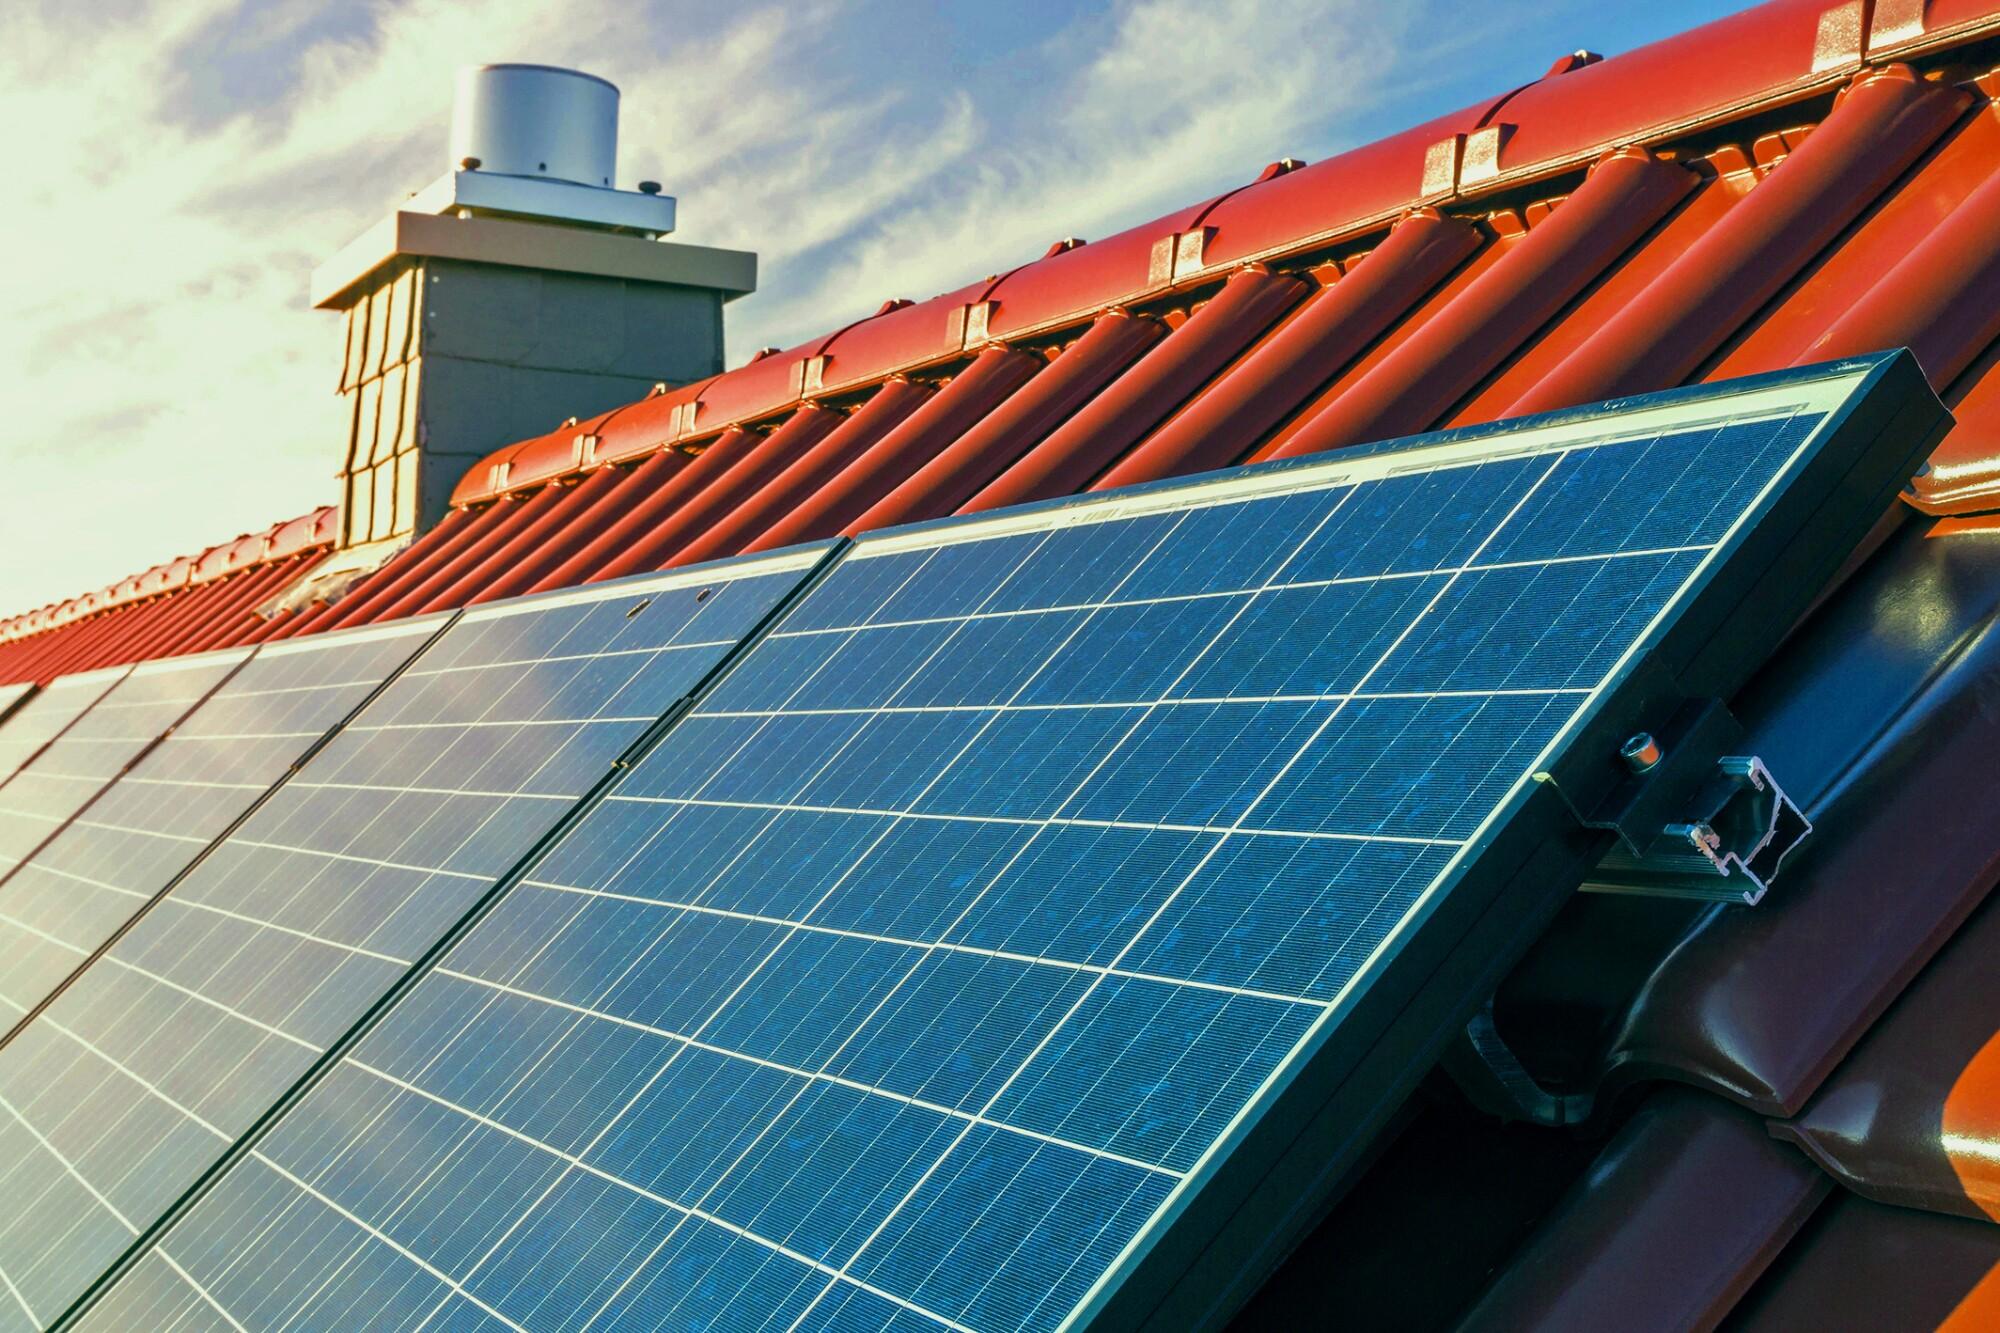 A residential solar installation by Sullivan Solar Power on a home in La Jolla.